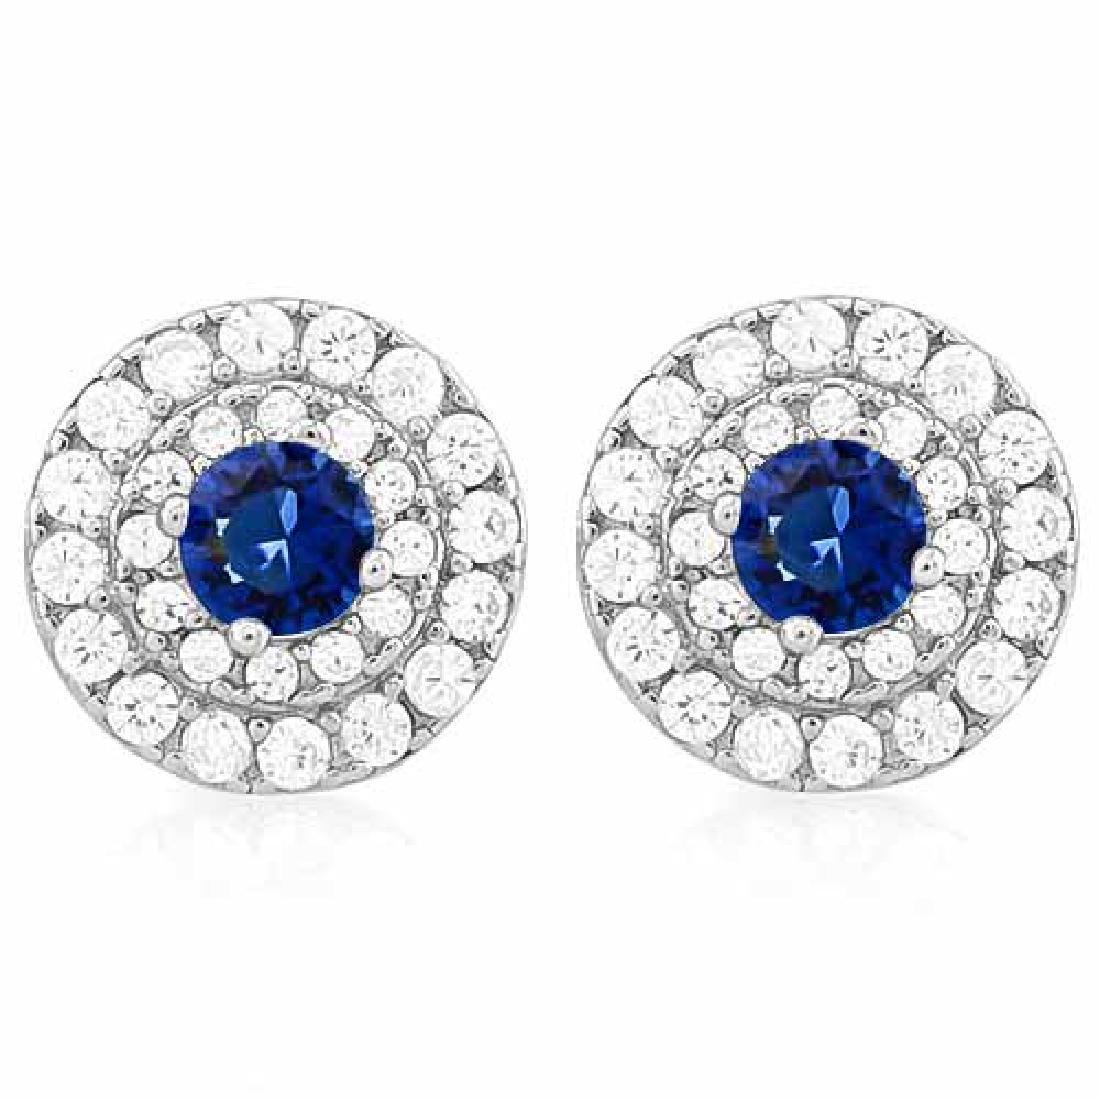 3/4 CARAT CREATED BLUE SAPPHIRE & 1/2 CARAT (56 PCS) FL